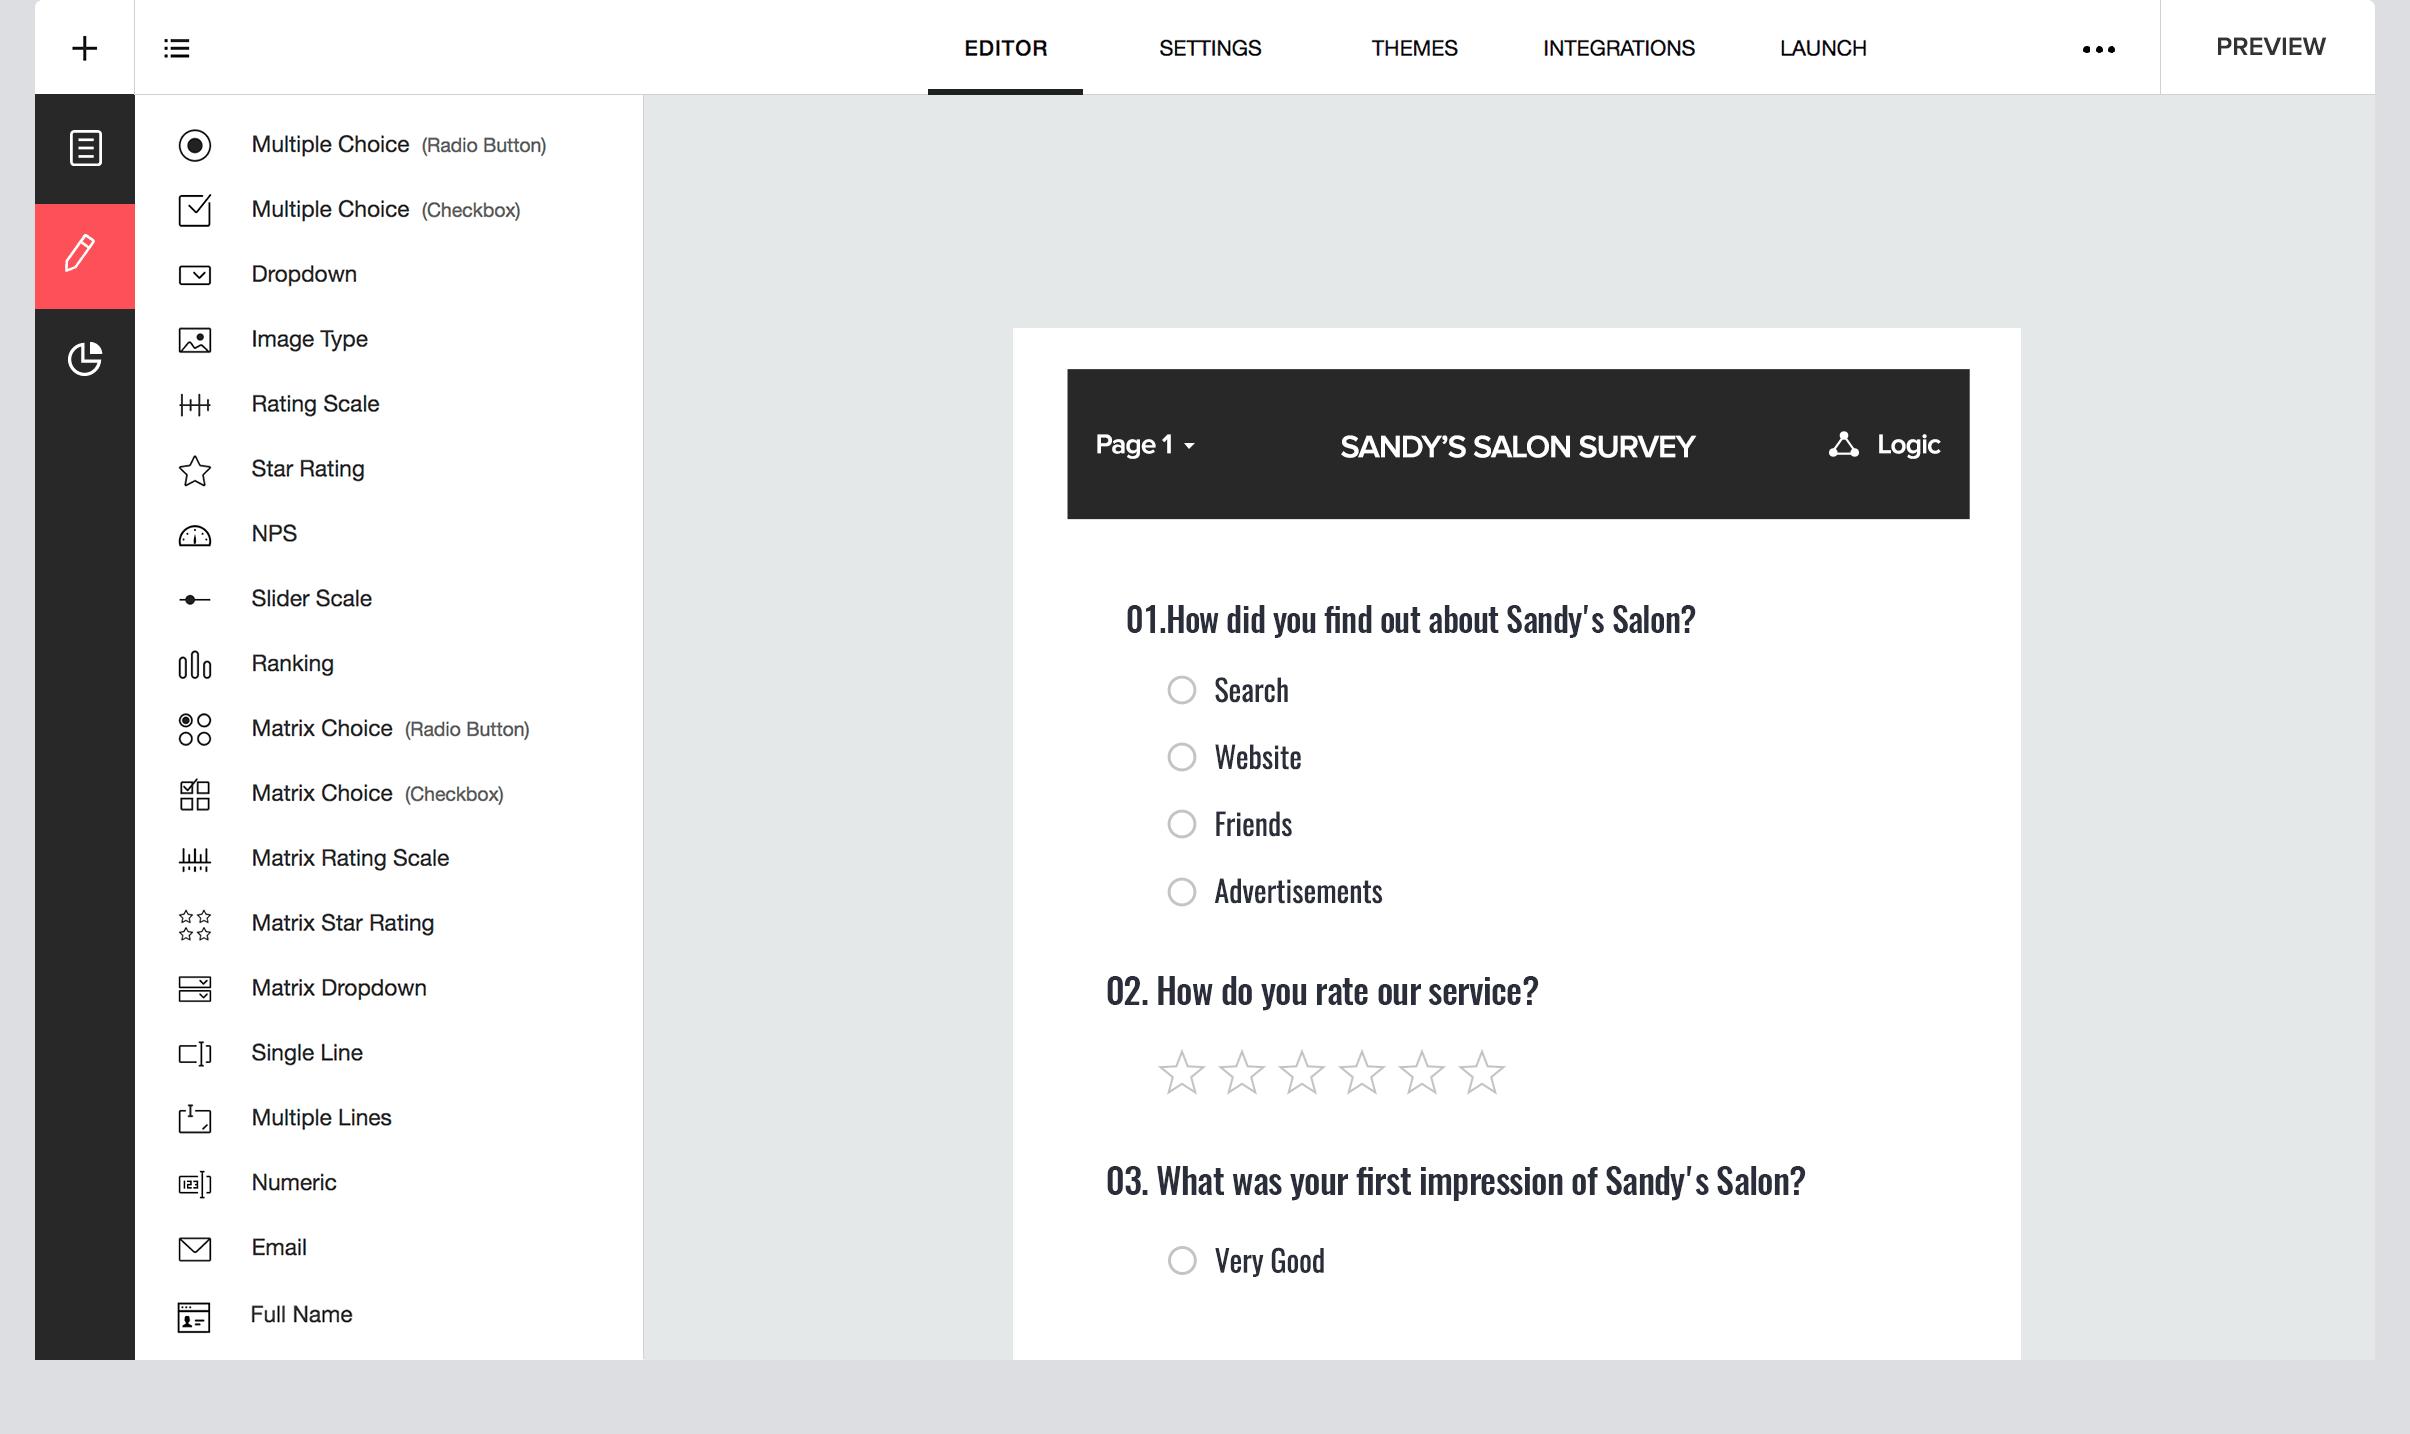 Zoho survey tool